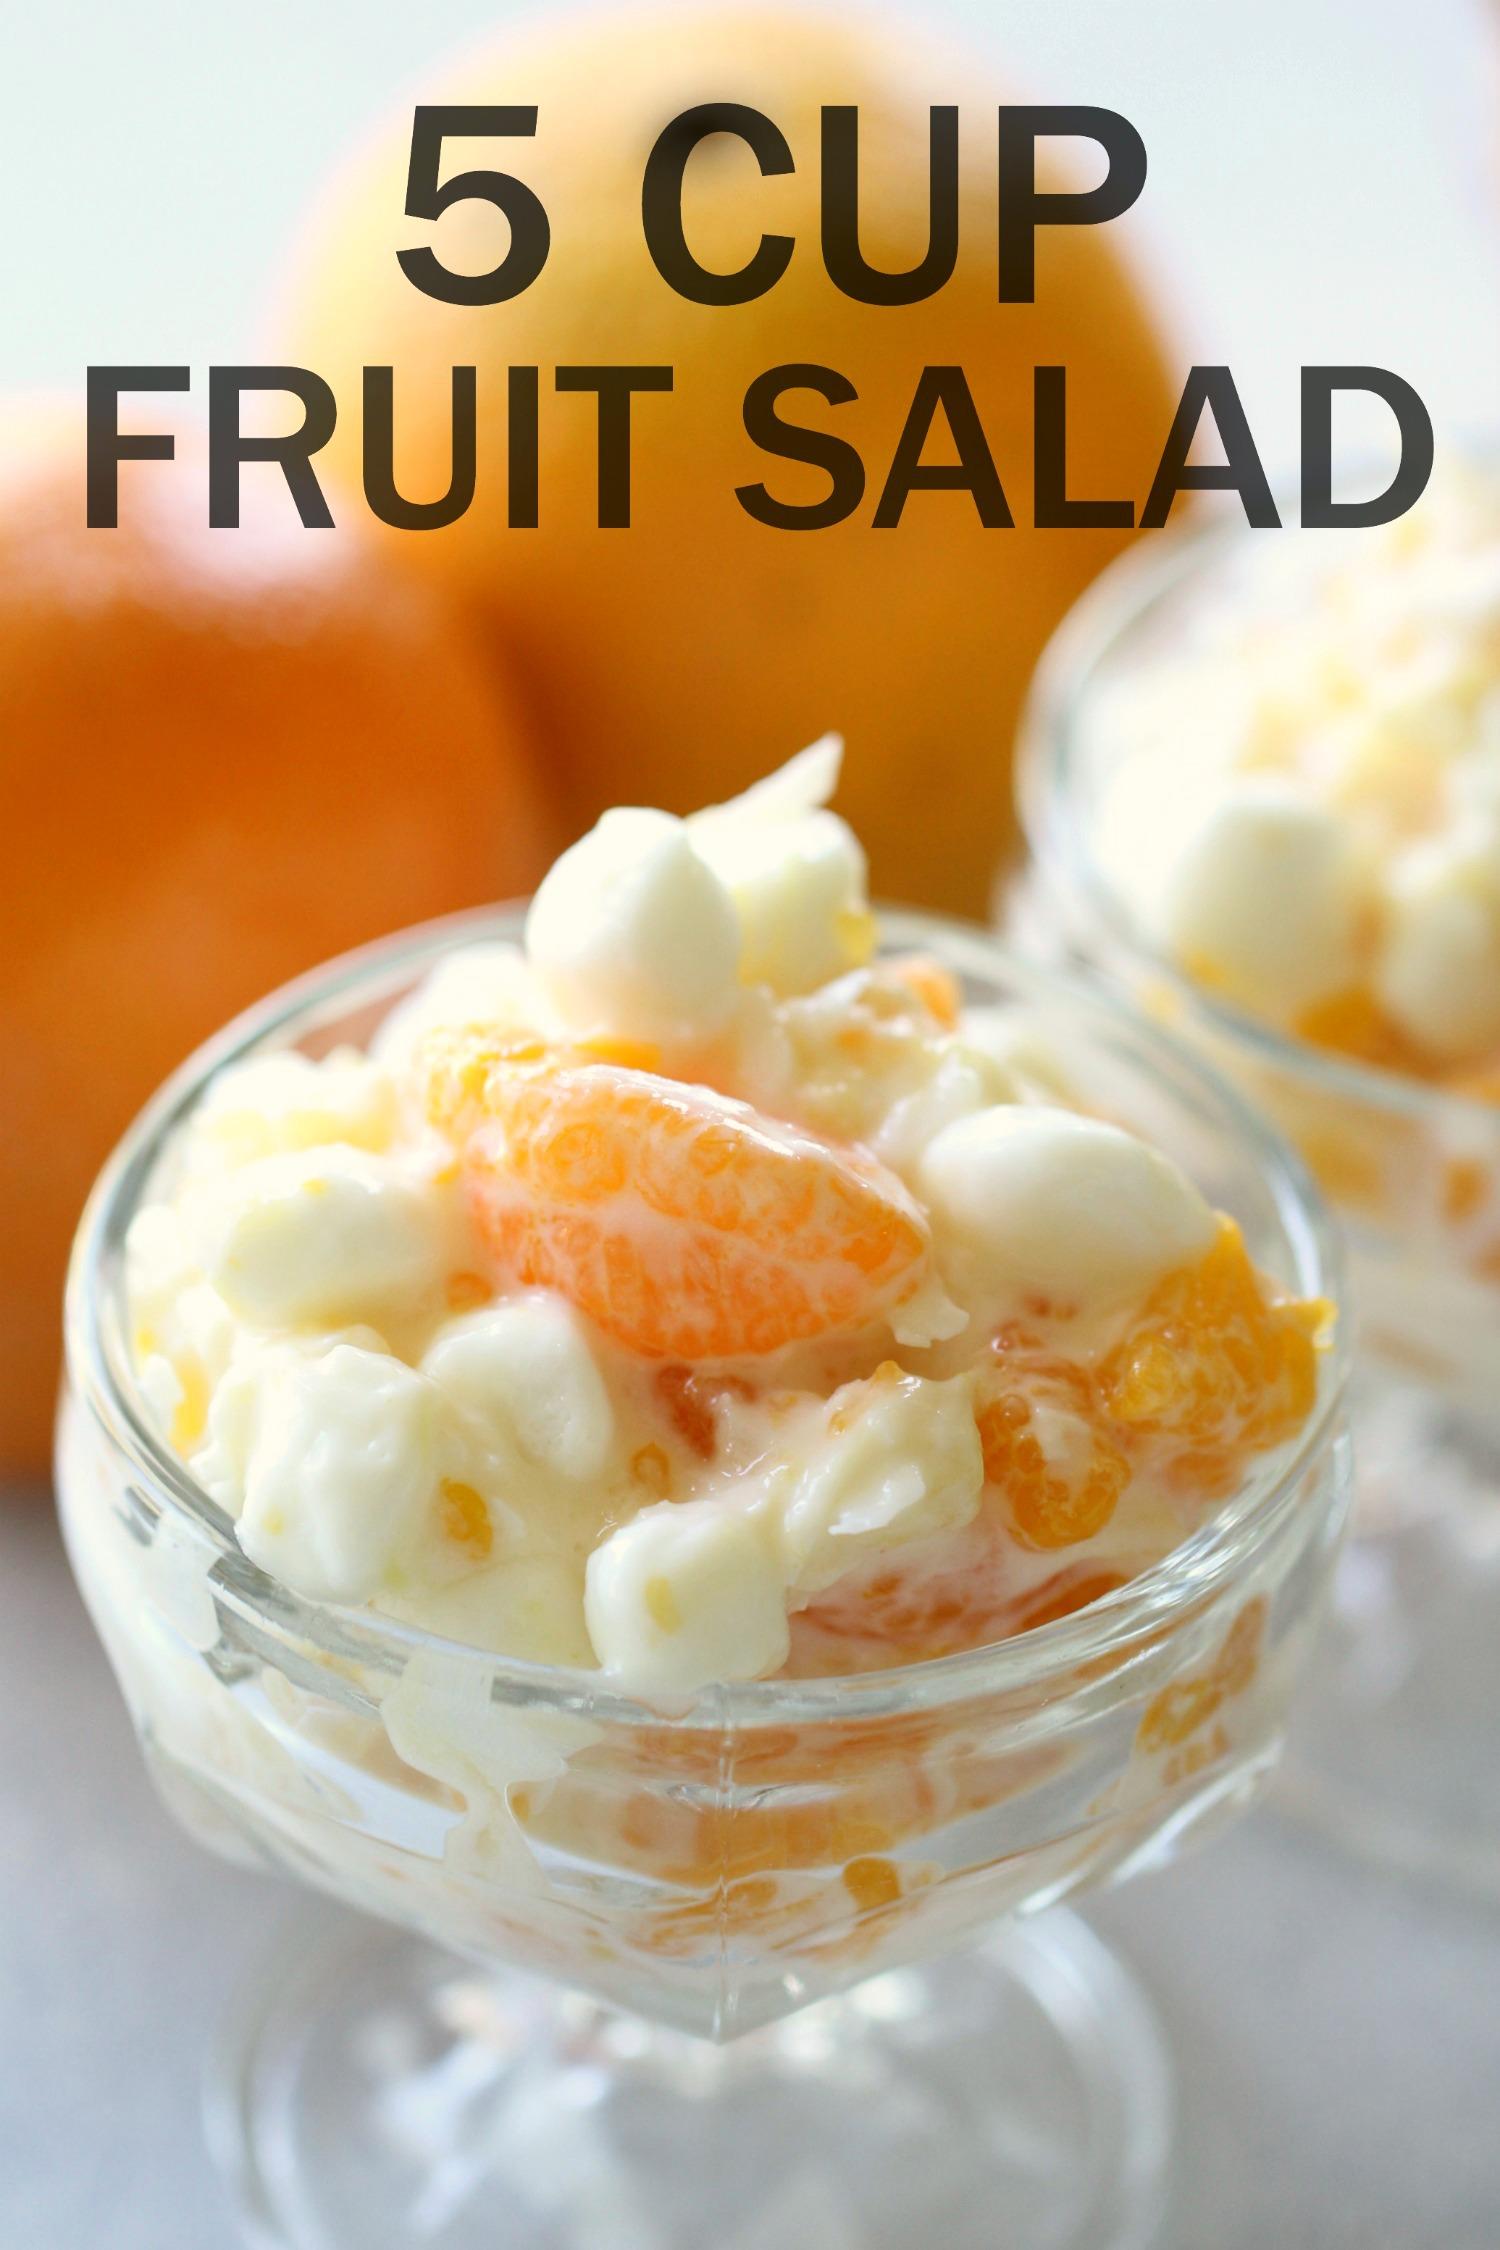 Grandma's 5 Cup Creamy Fruit Salad in glass dish